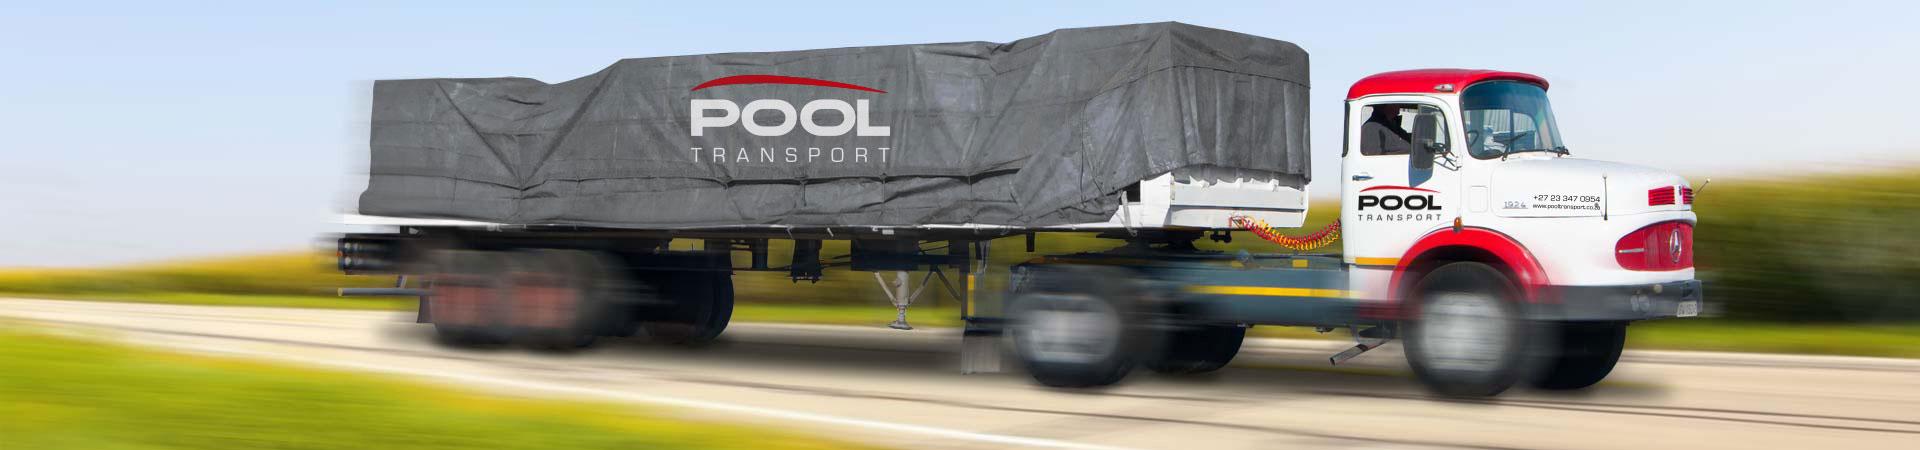 s n pool transport since 1955